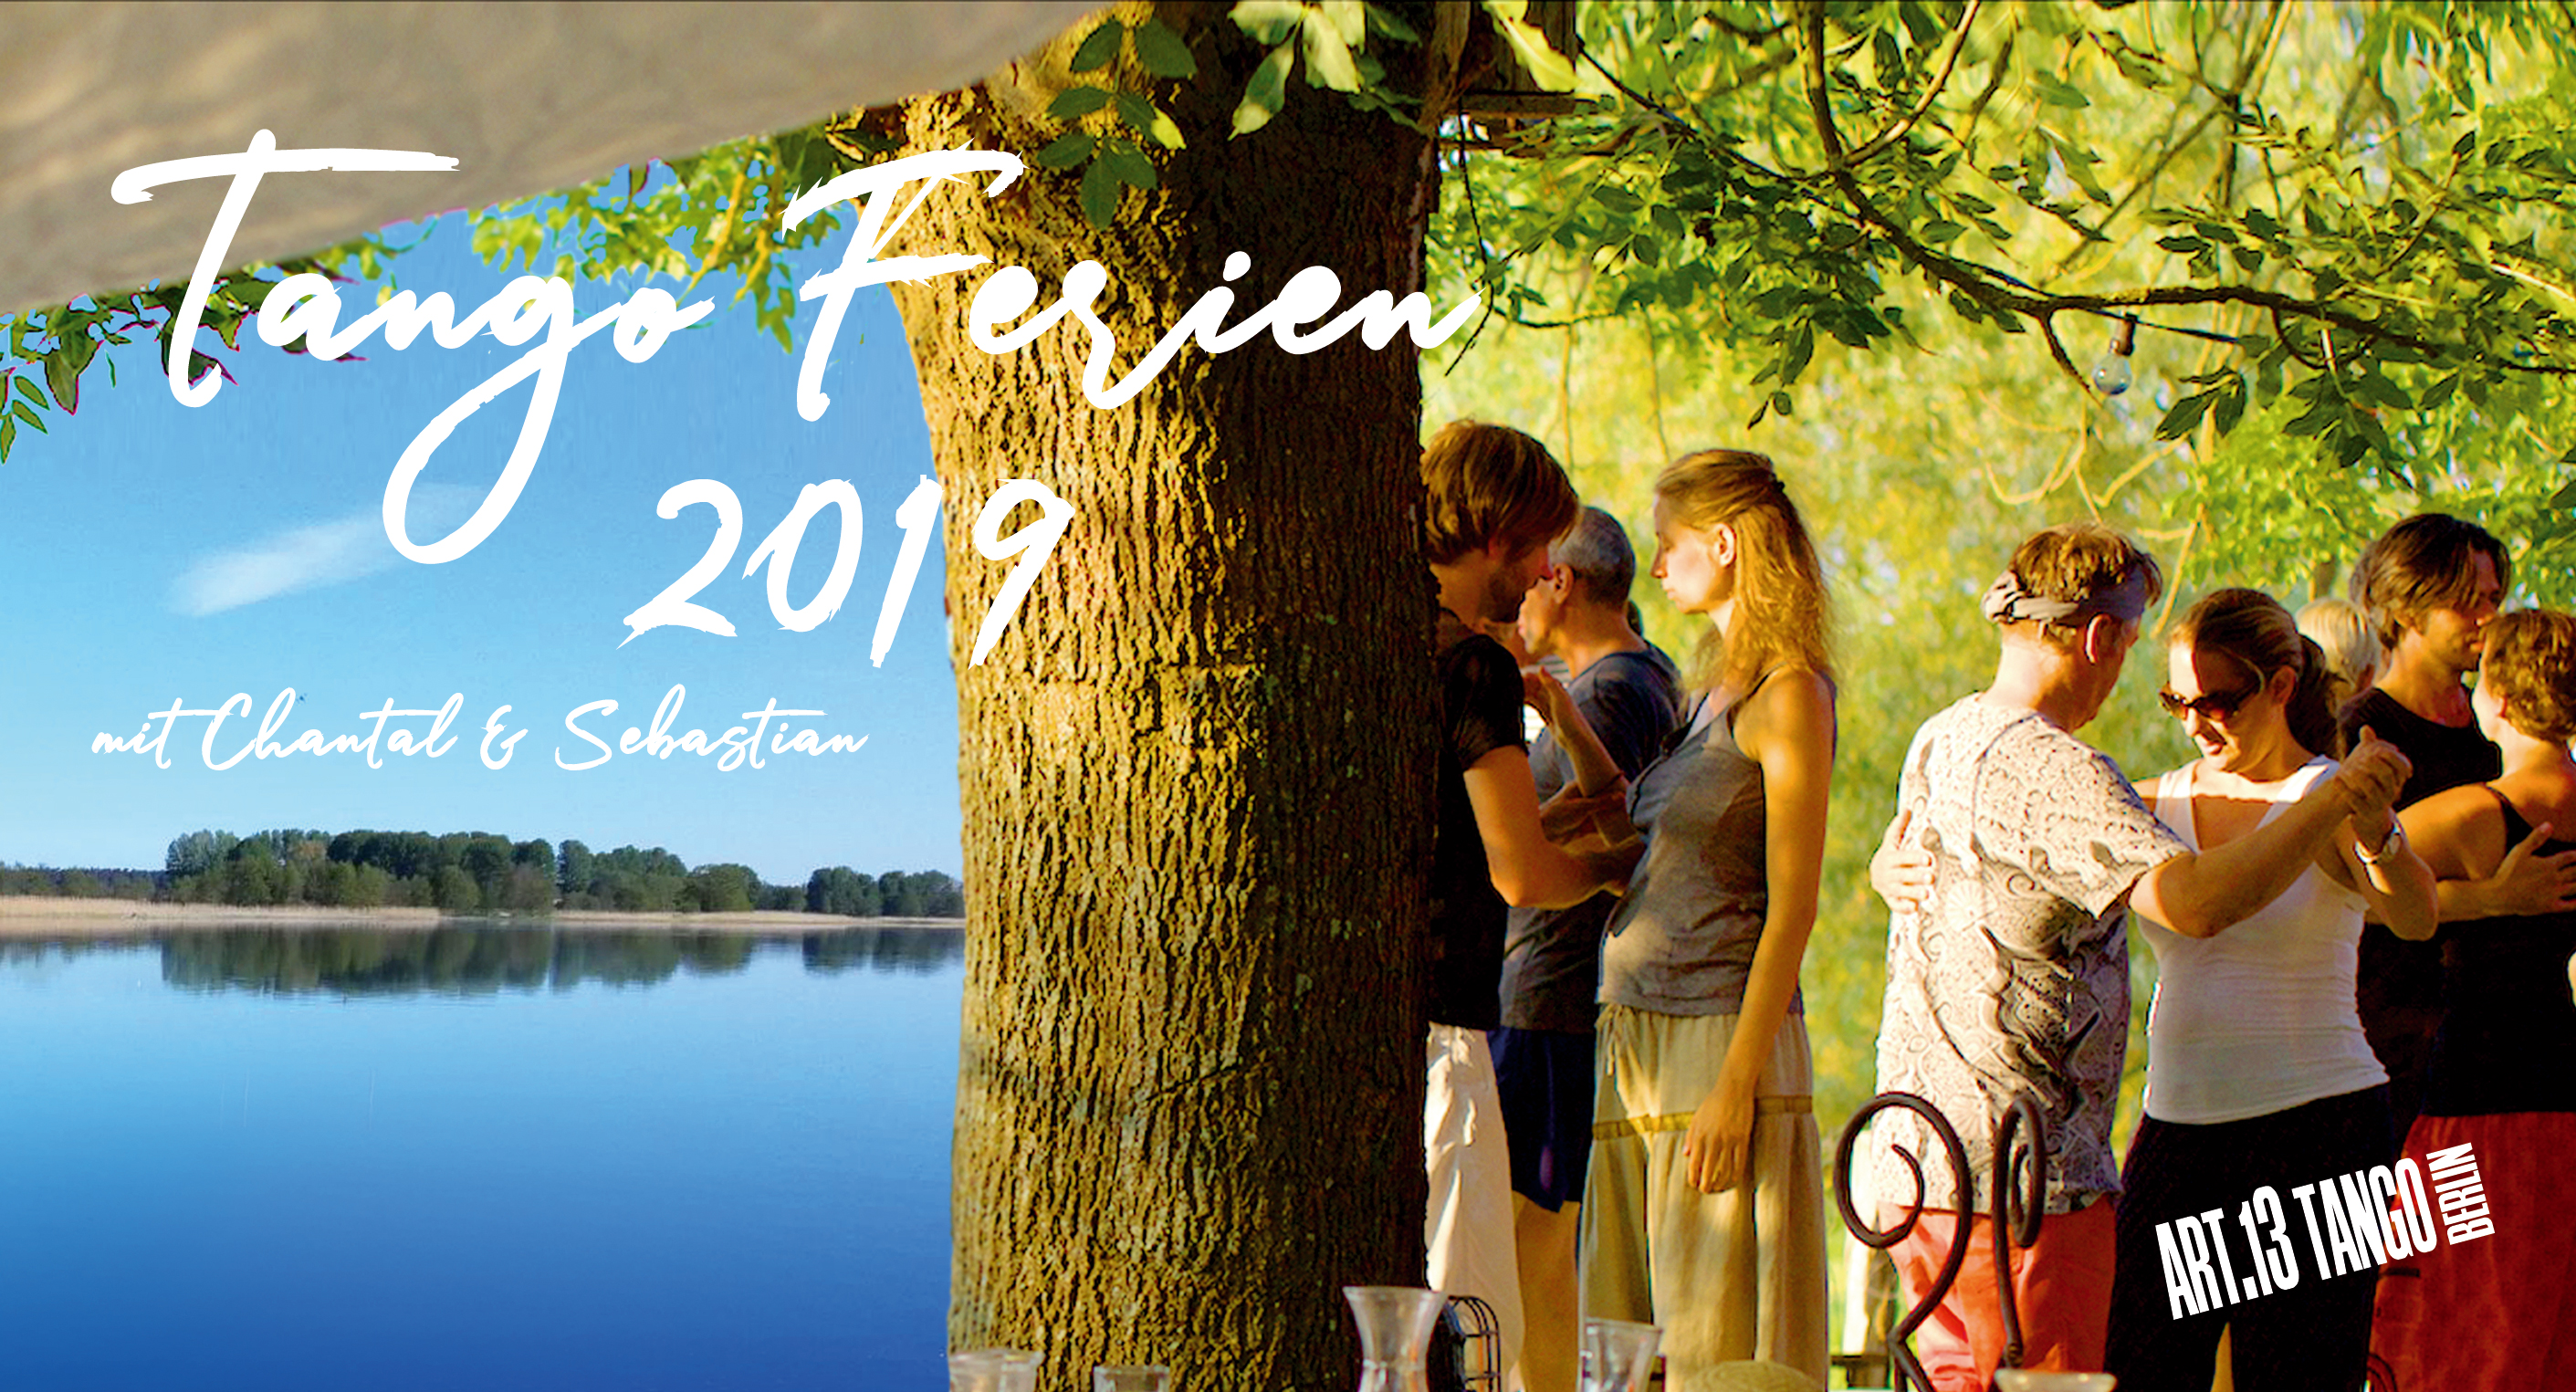 Sommer-Tangocamp Barnin am See